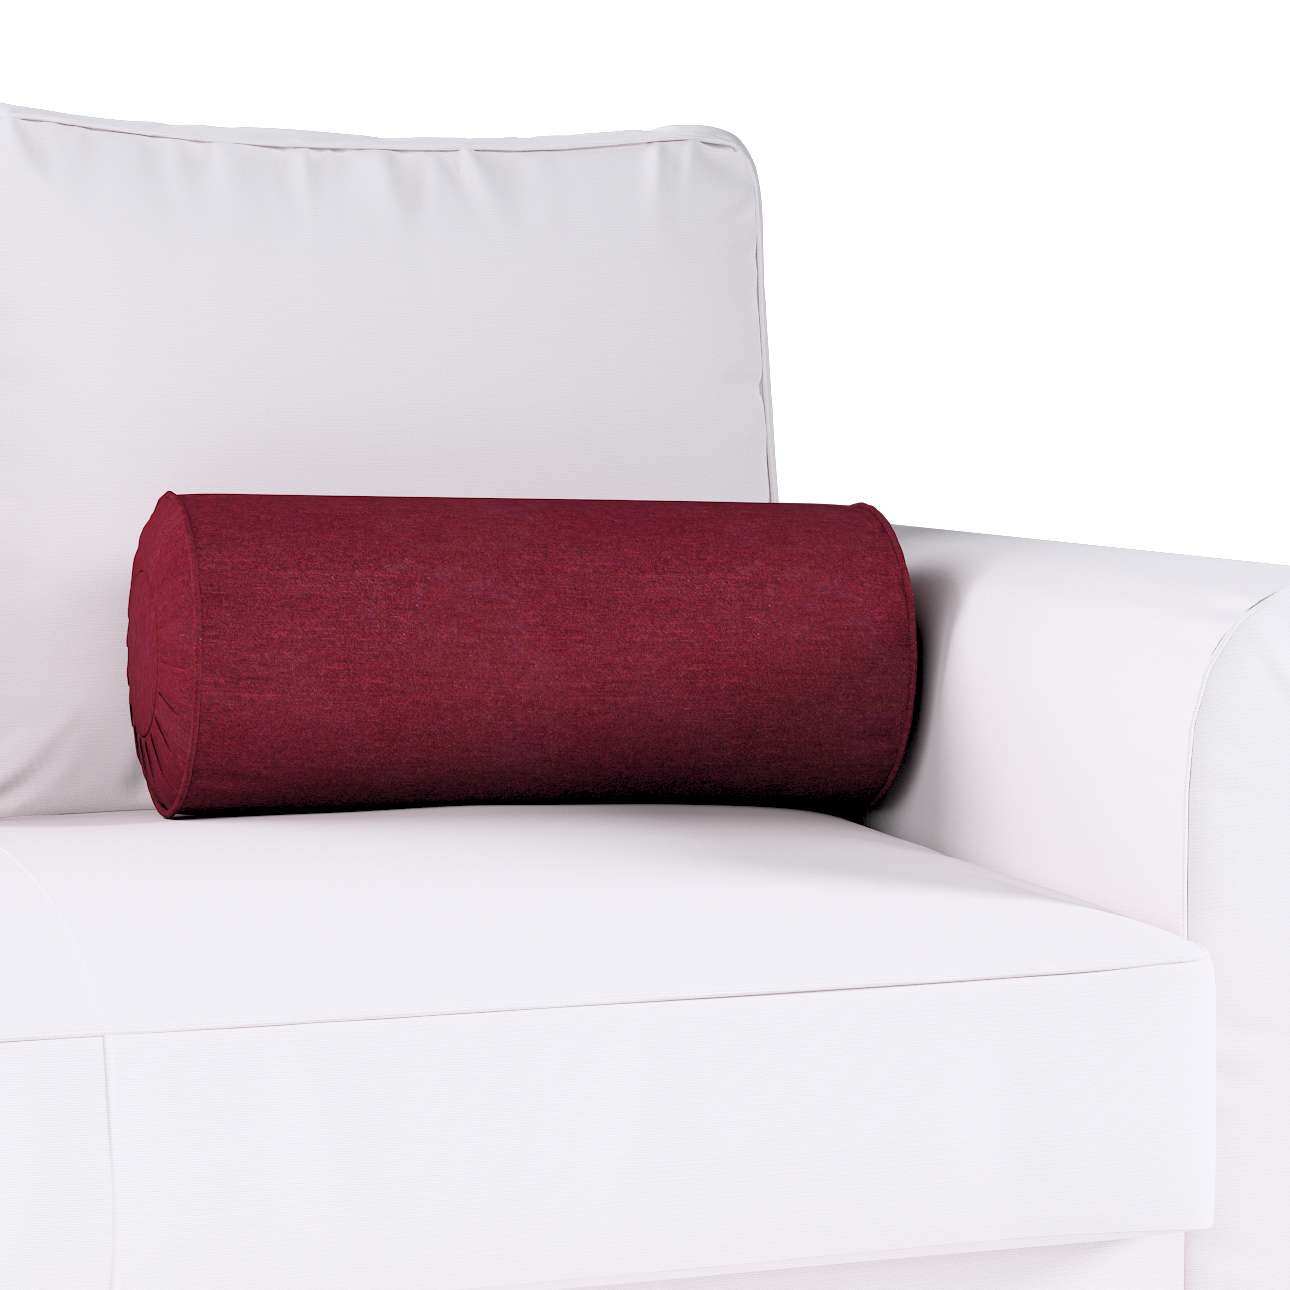 nackenrolle mit falten bordeaux dekoria. Black Bedroom Furniture Sets. Home Design Ideas